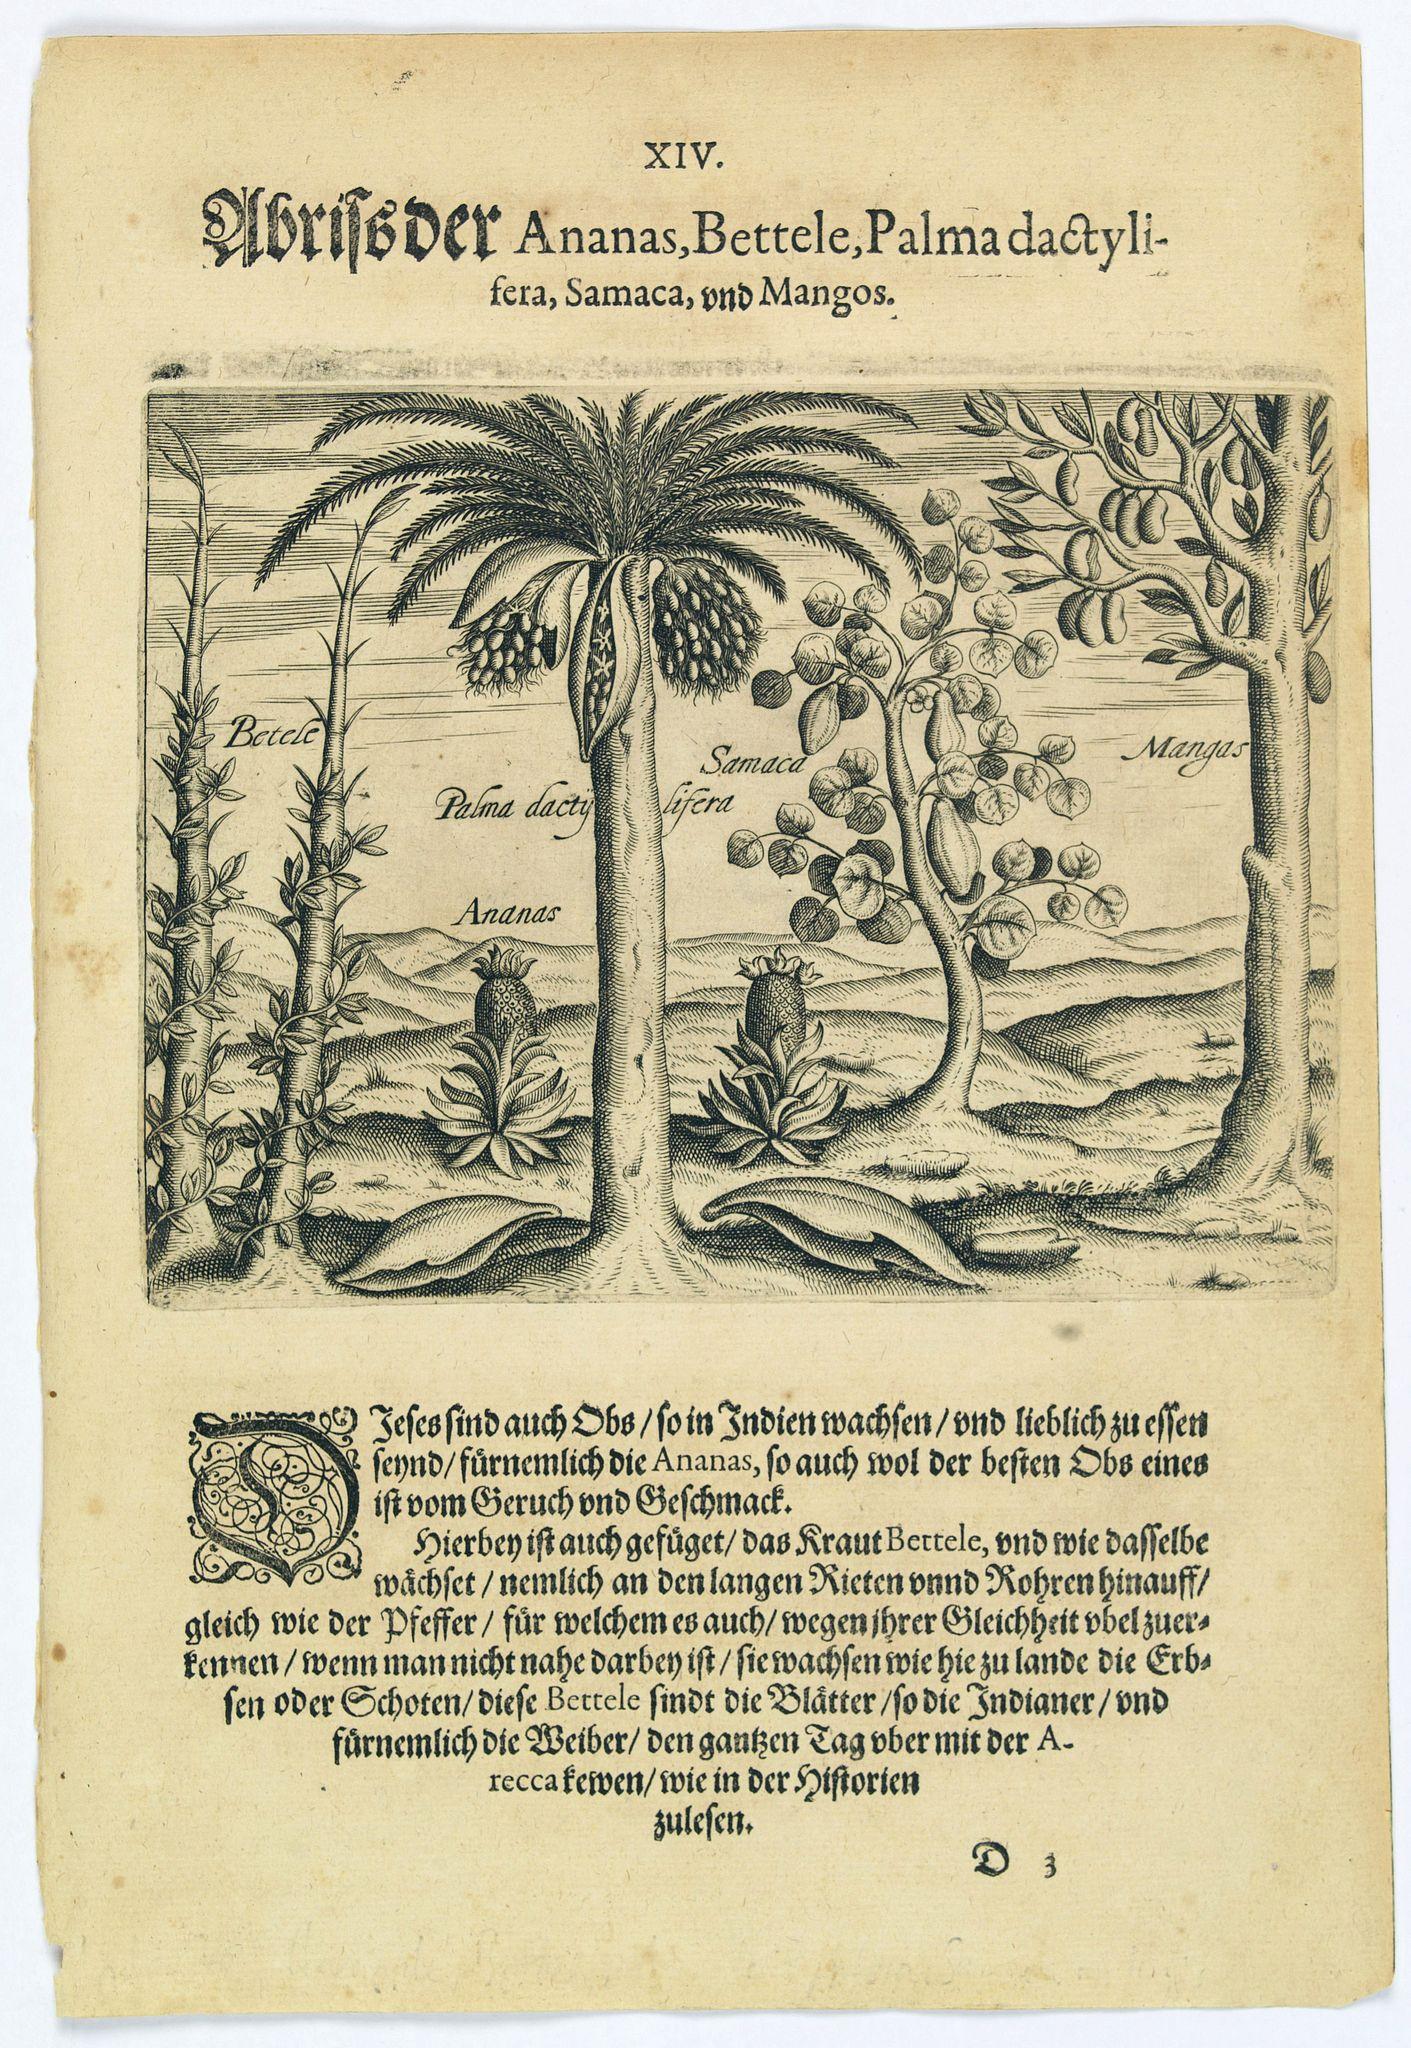 DE BRY, Th. -  Pineapple, Bettel, palma dactylifera, Samaca & Mango.